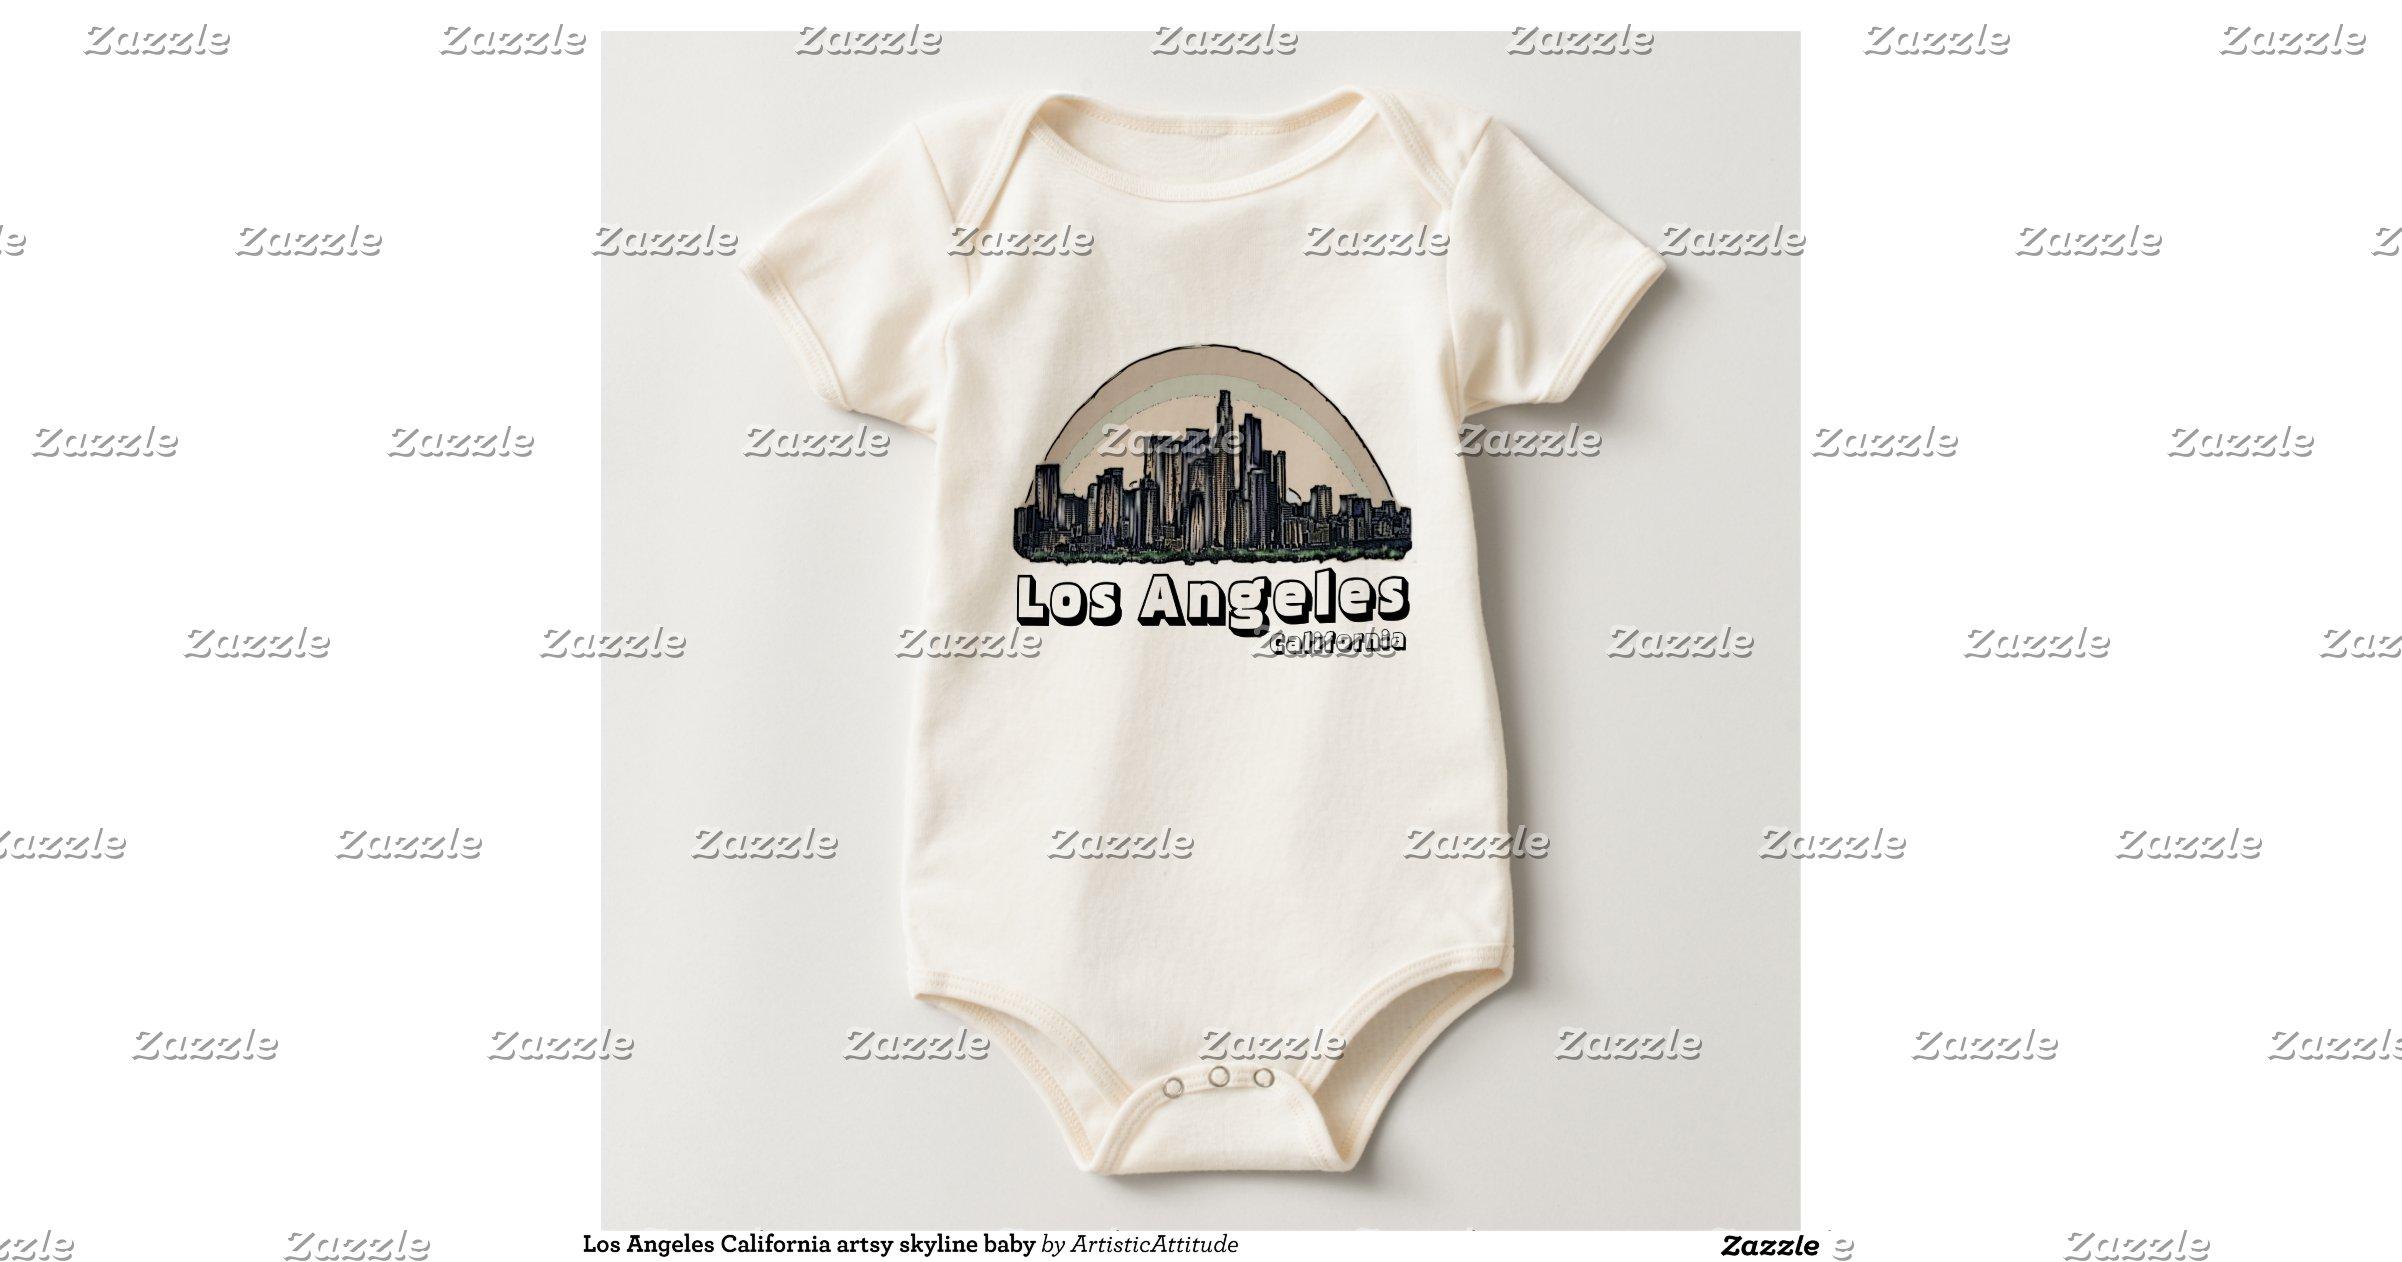 Baby Gift Baskets Los Angeles Ca : Los angeles california artsy skyline baby creeper zazzle